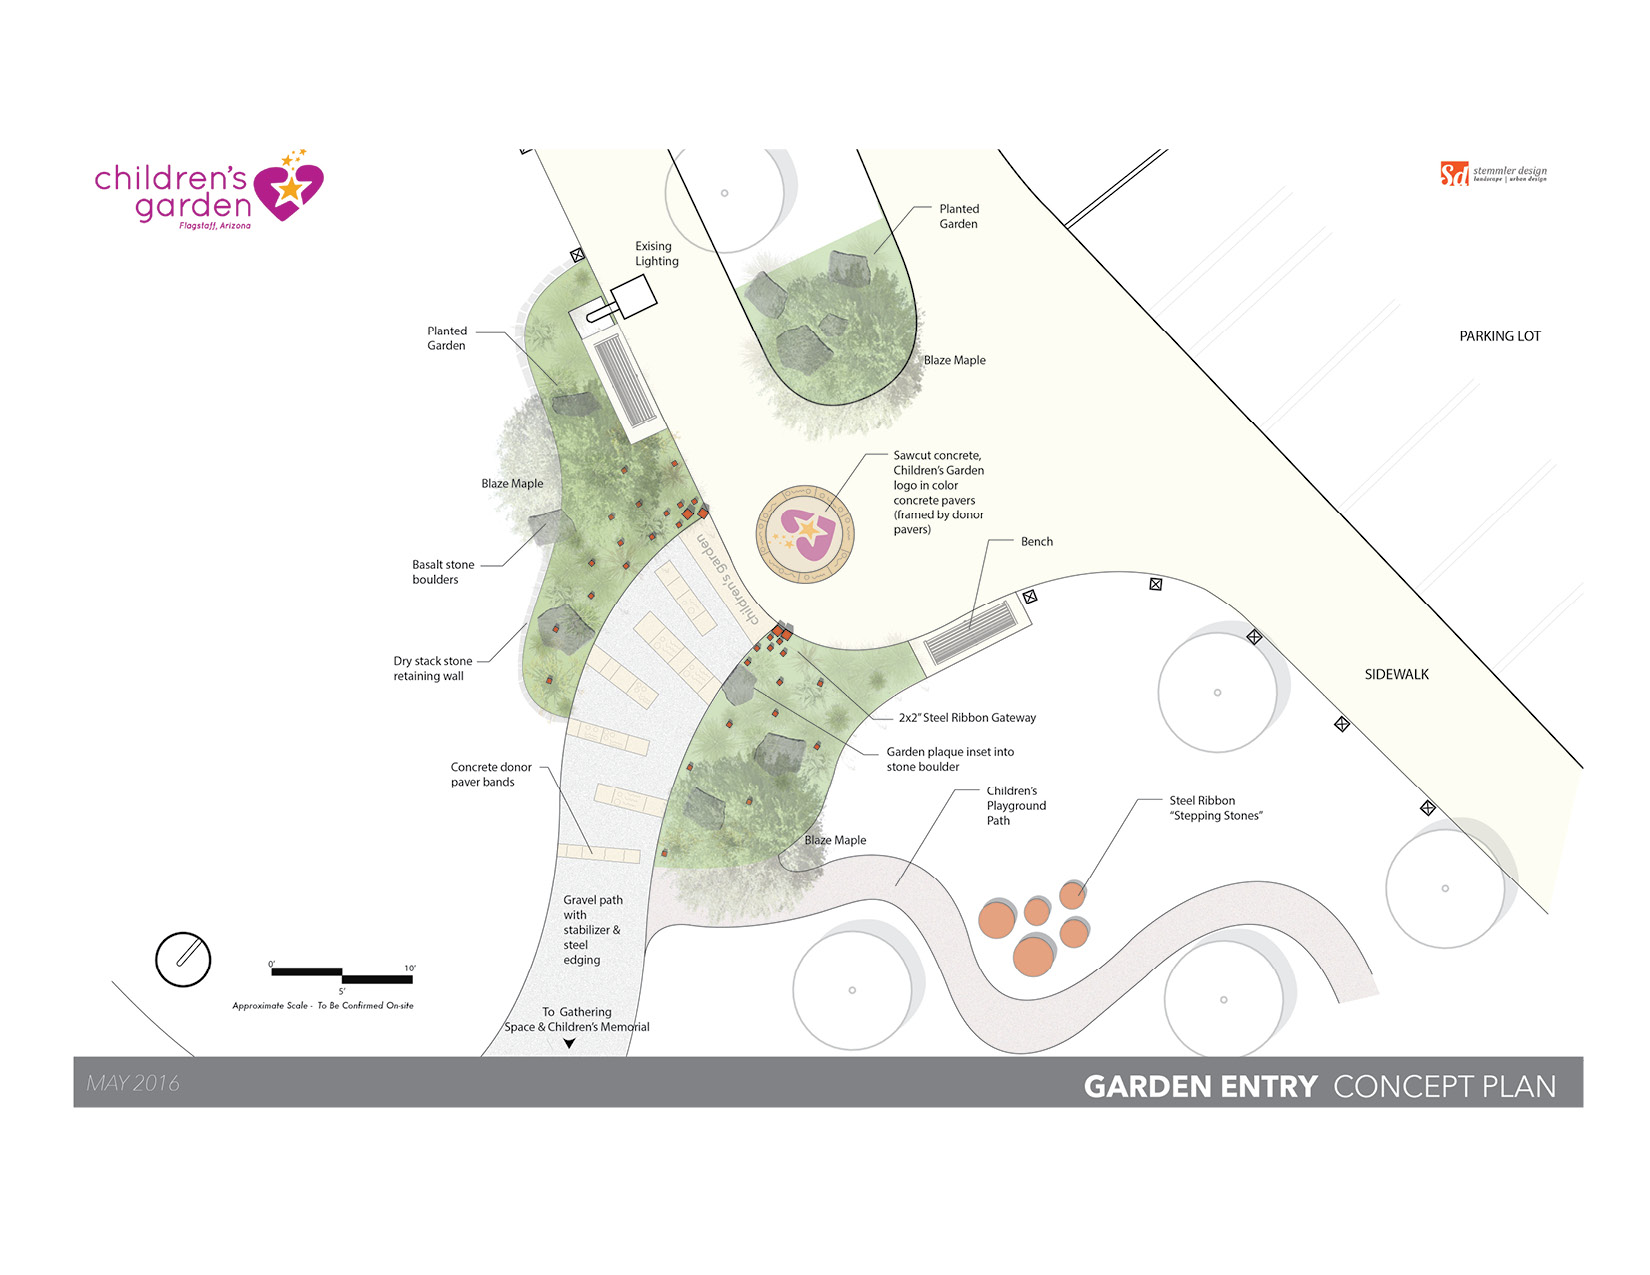 Children's Garden Entry Plan.6.8.16.jpg